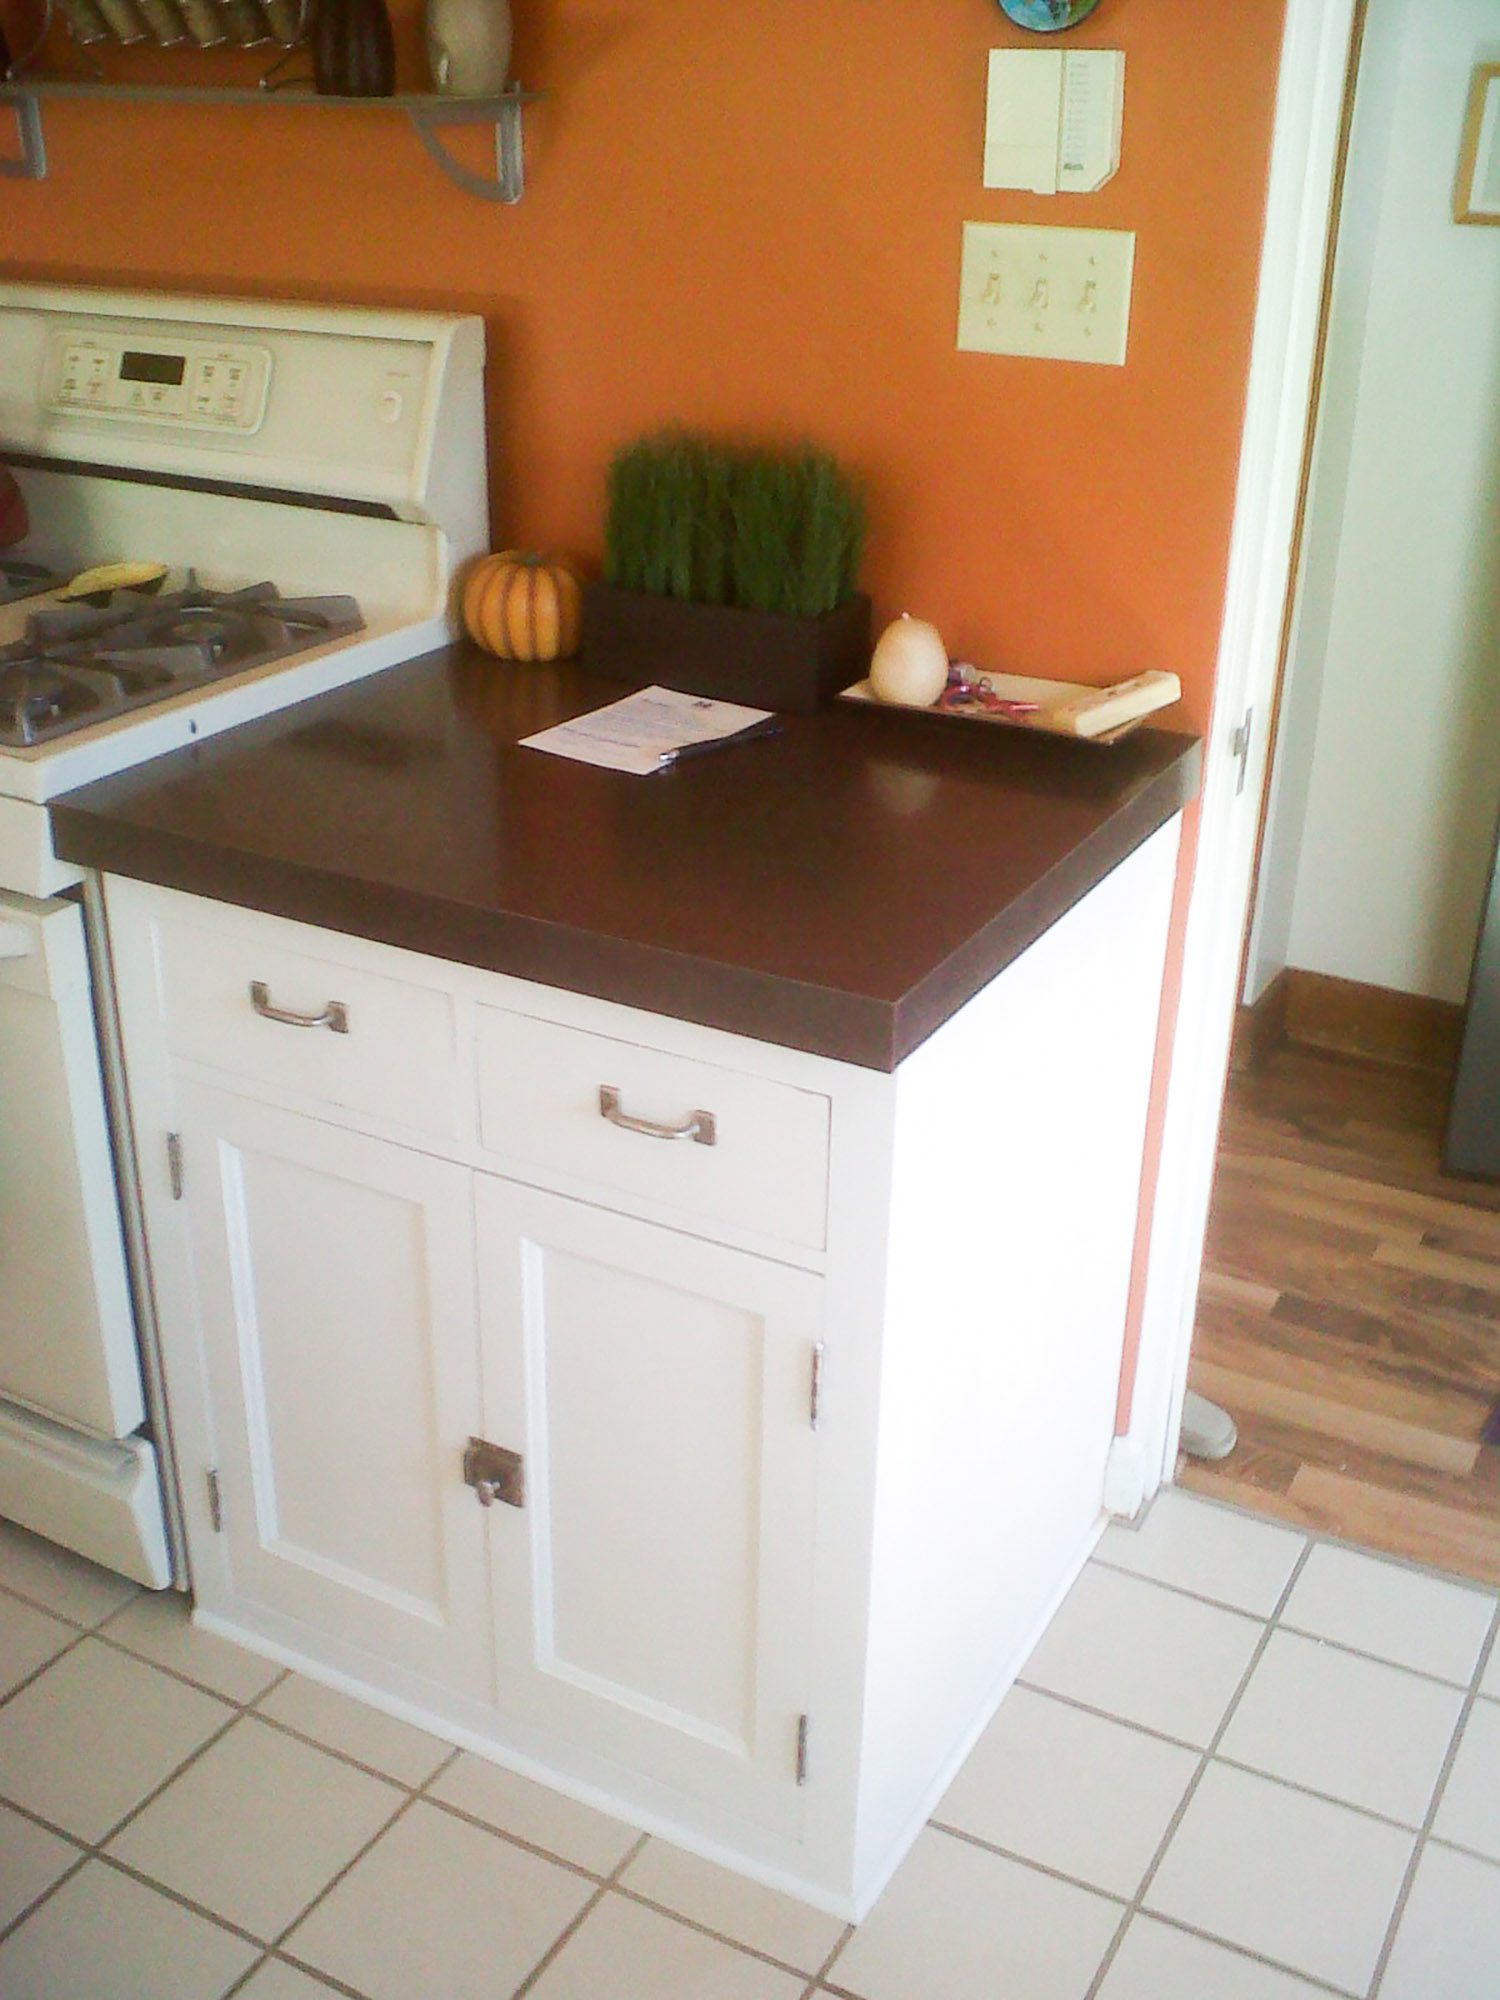 kitchen basecabinet_web.jpg